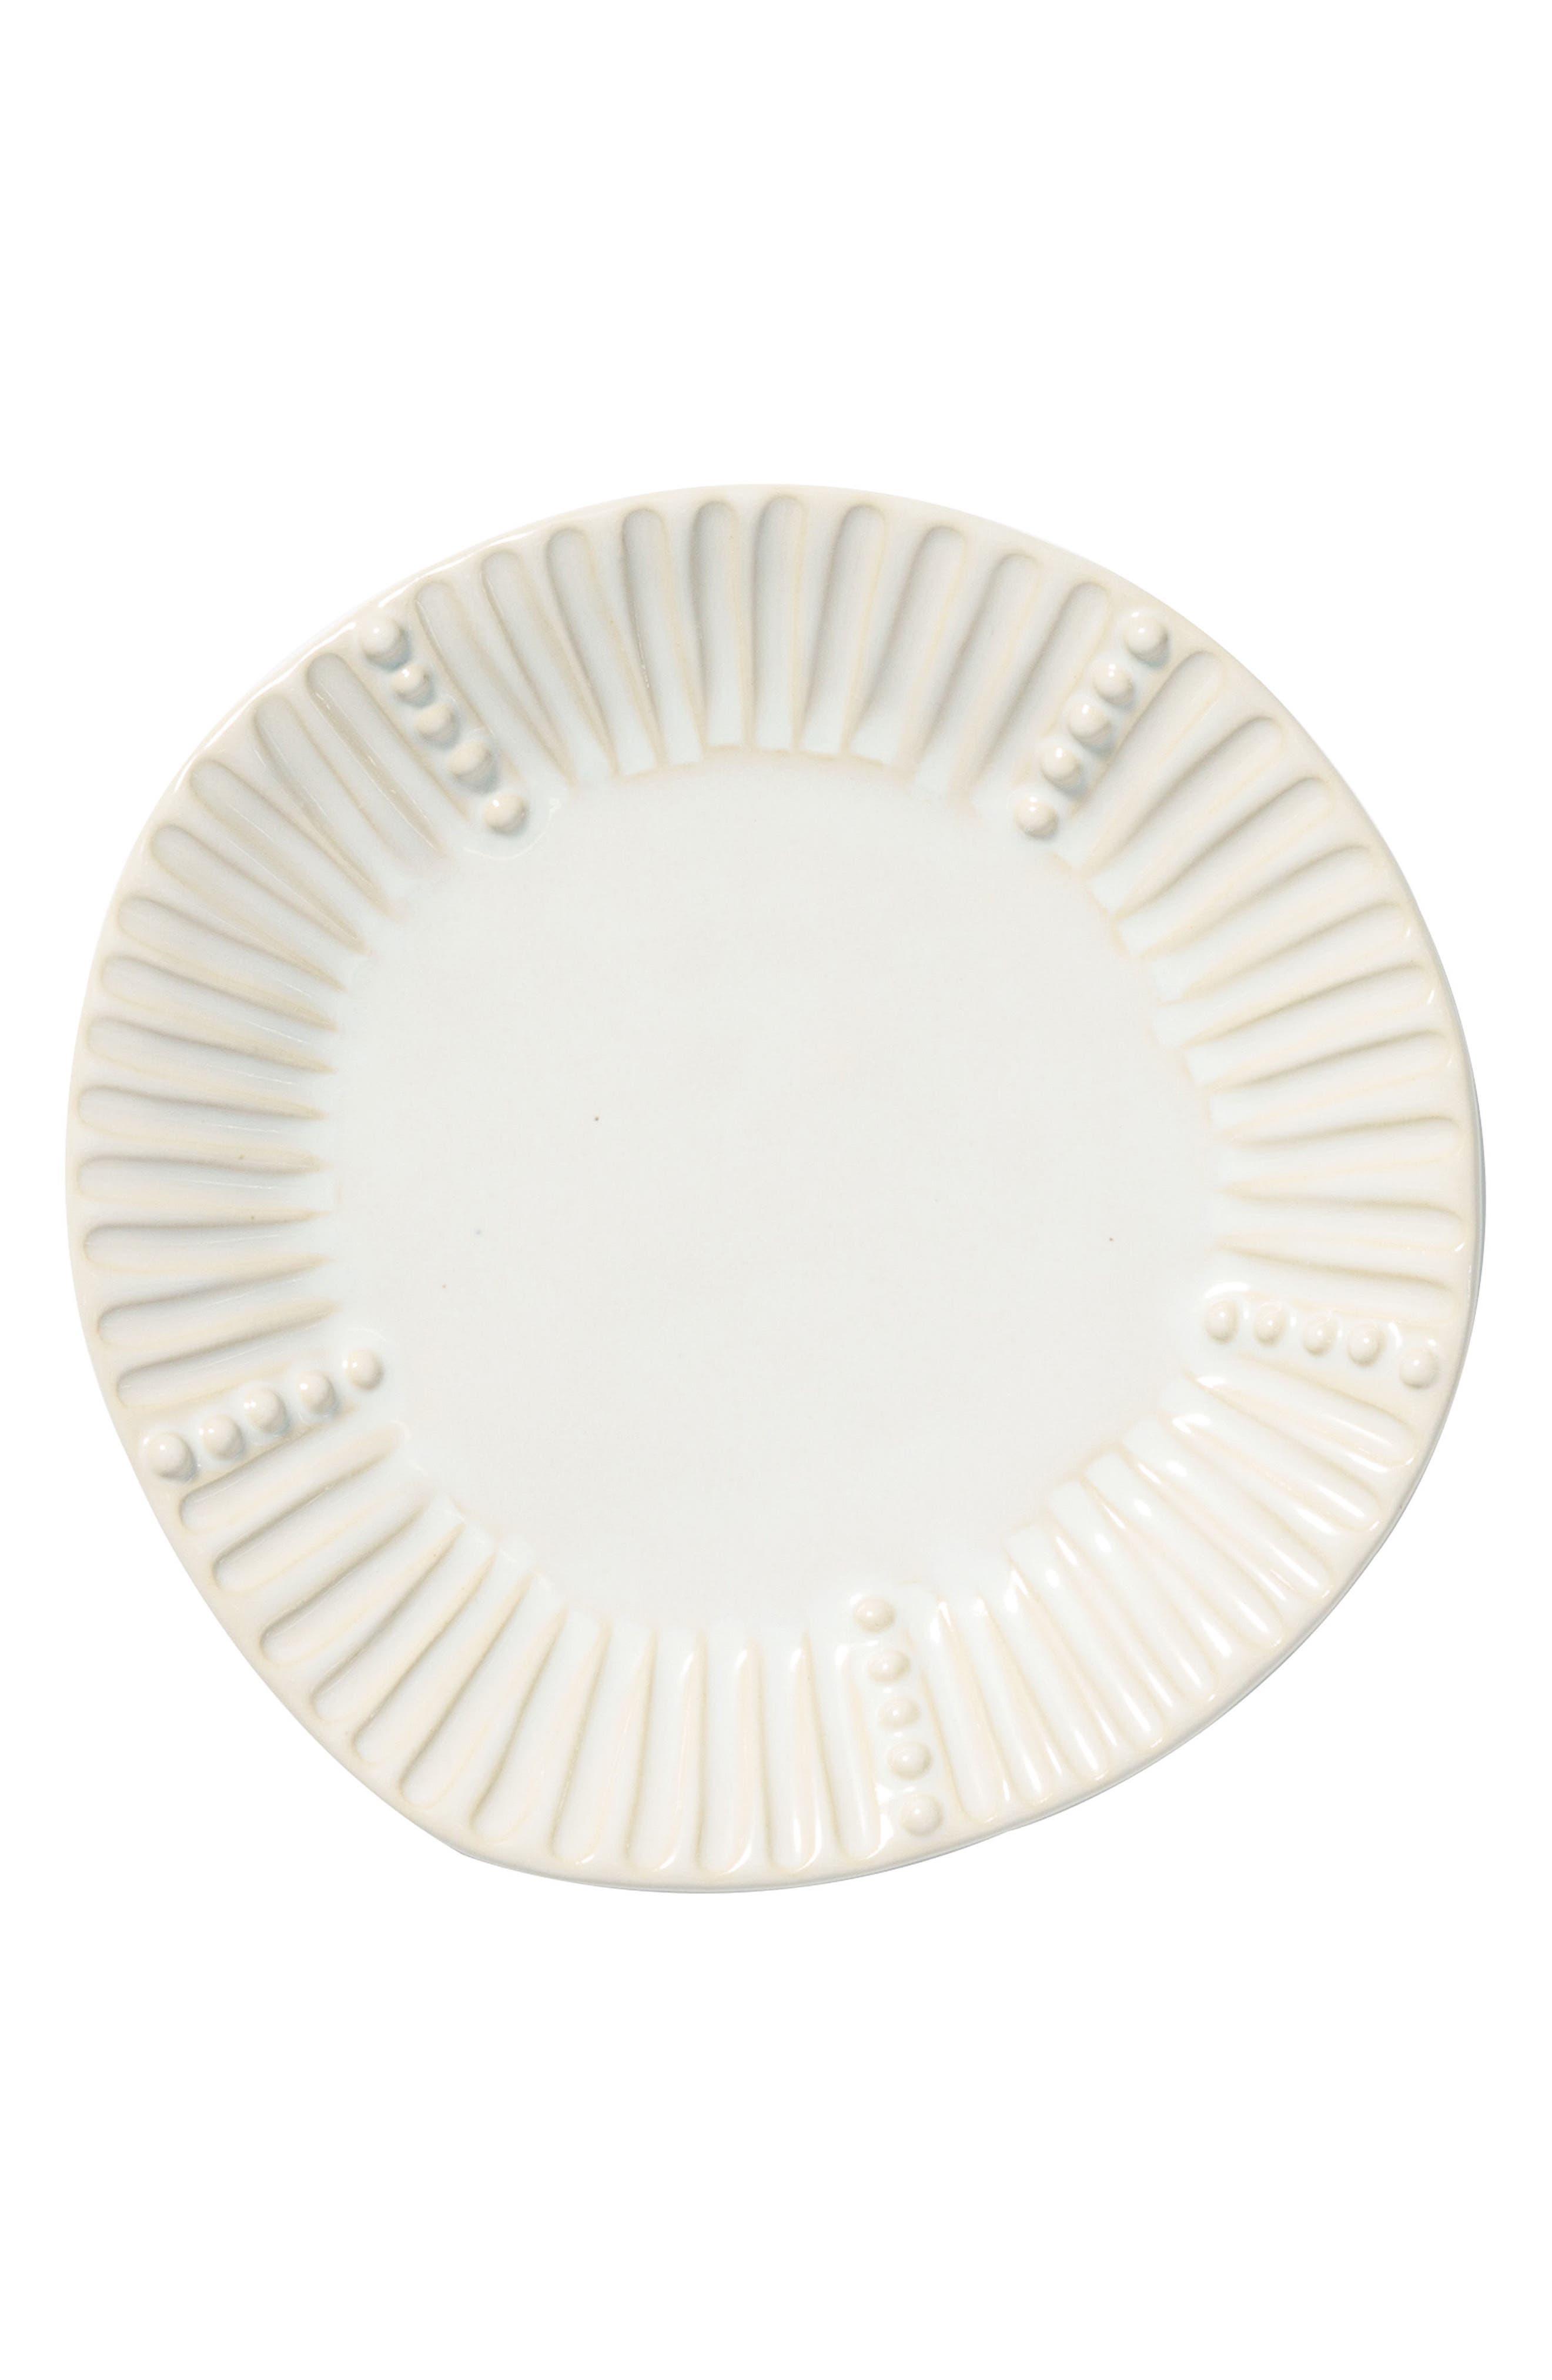 Alternate Image 1 Selected - VIETRI Incanto Stone Stripe Salad Plate